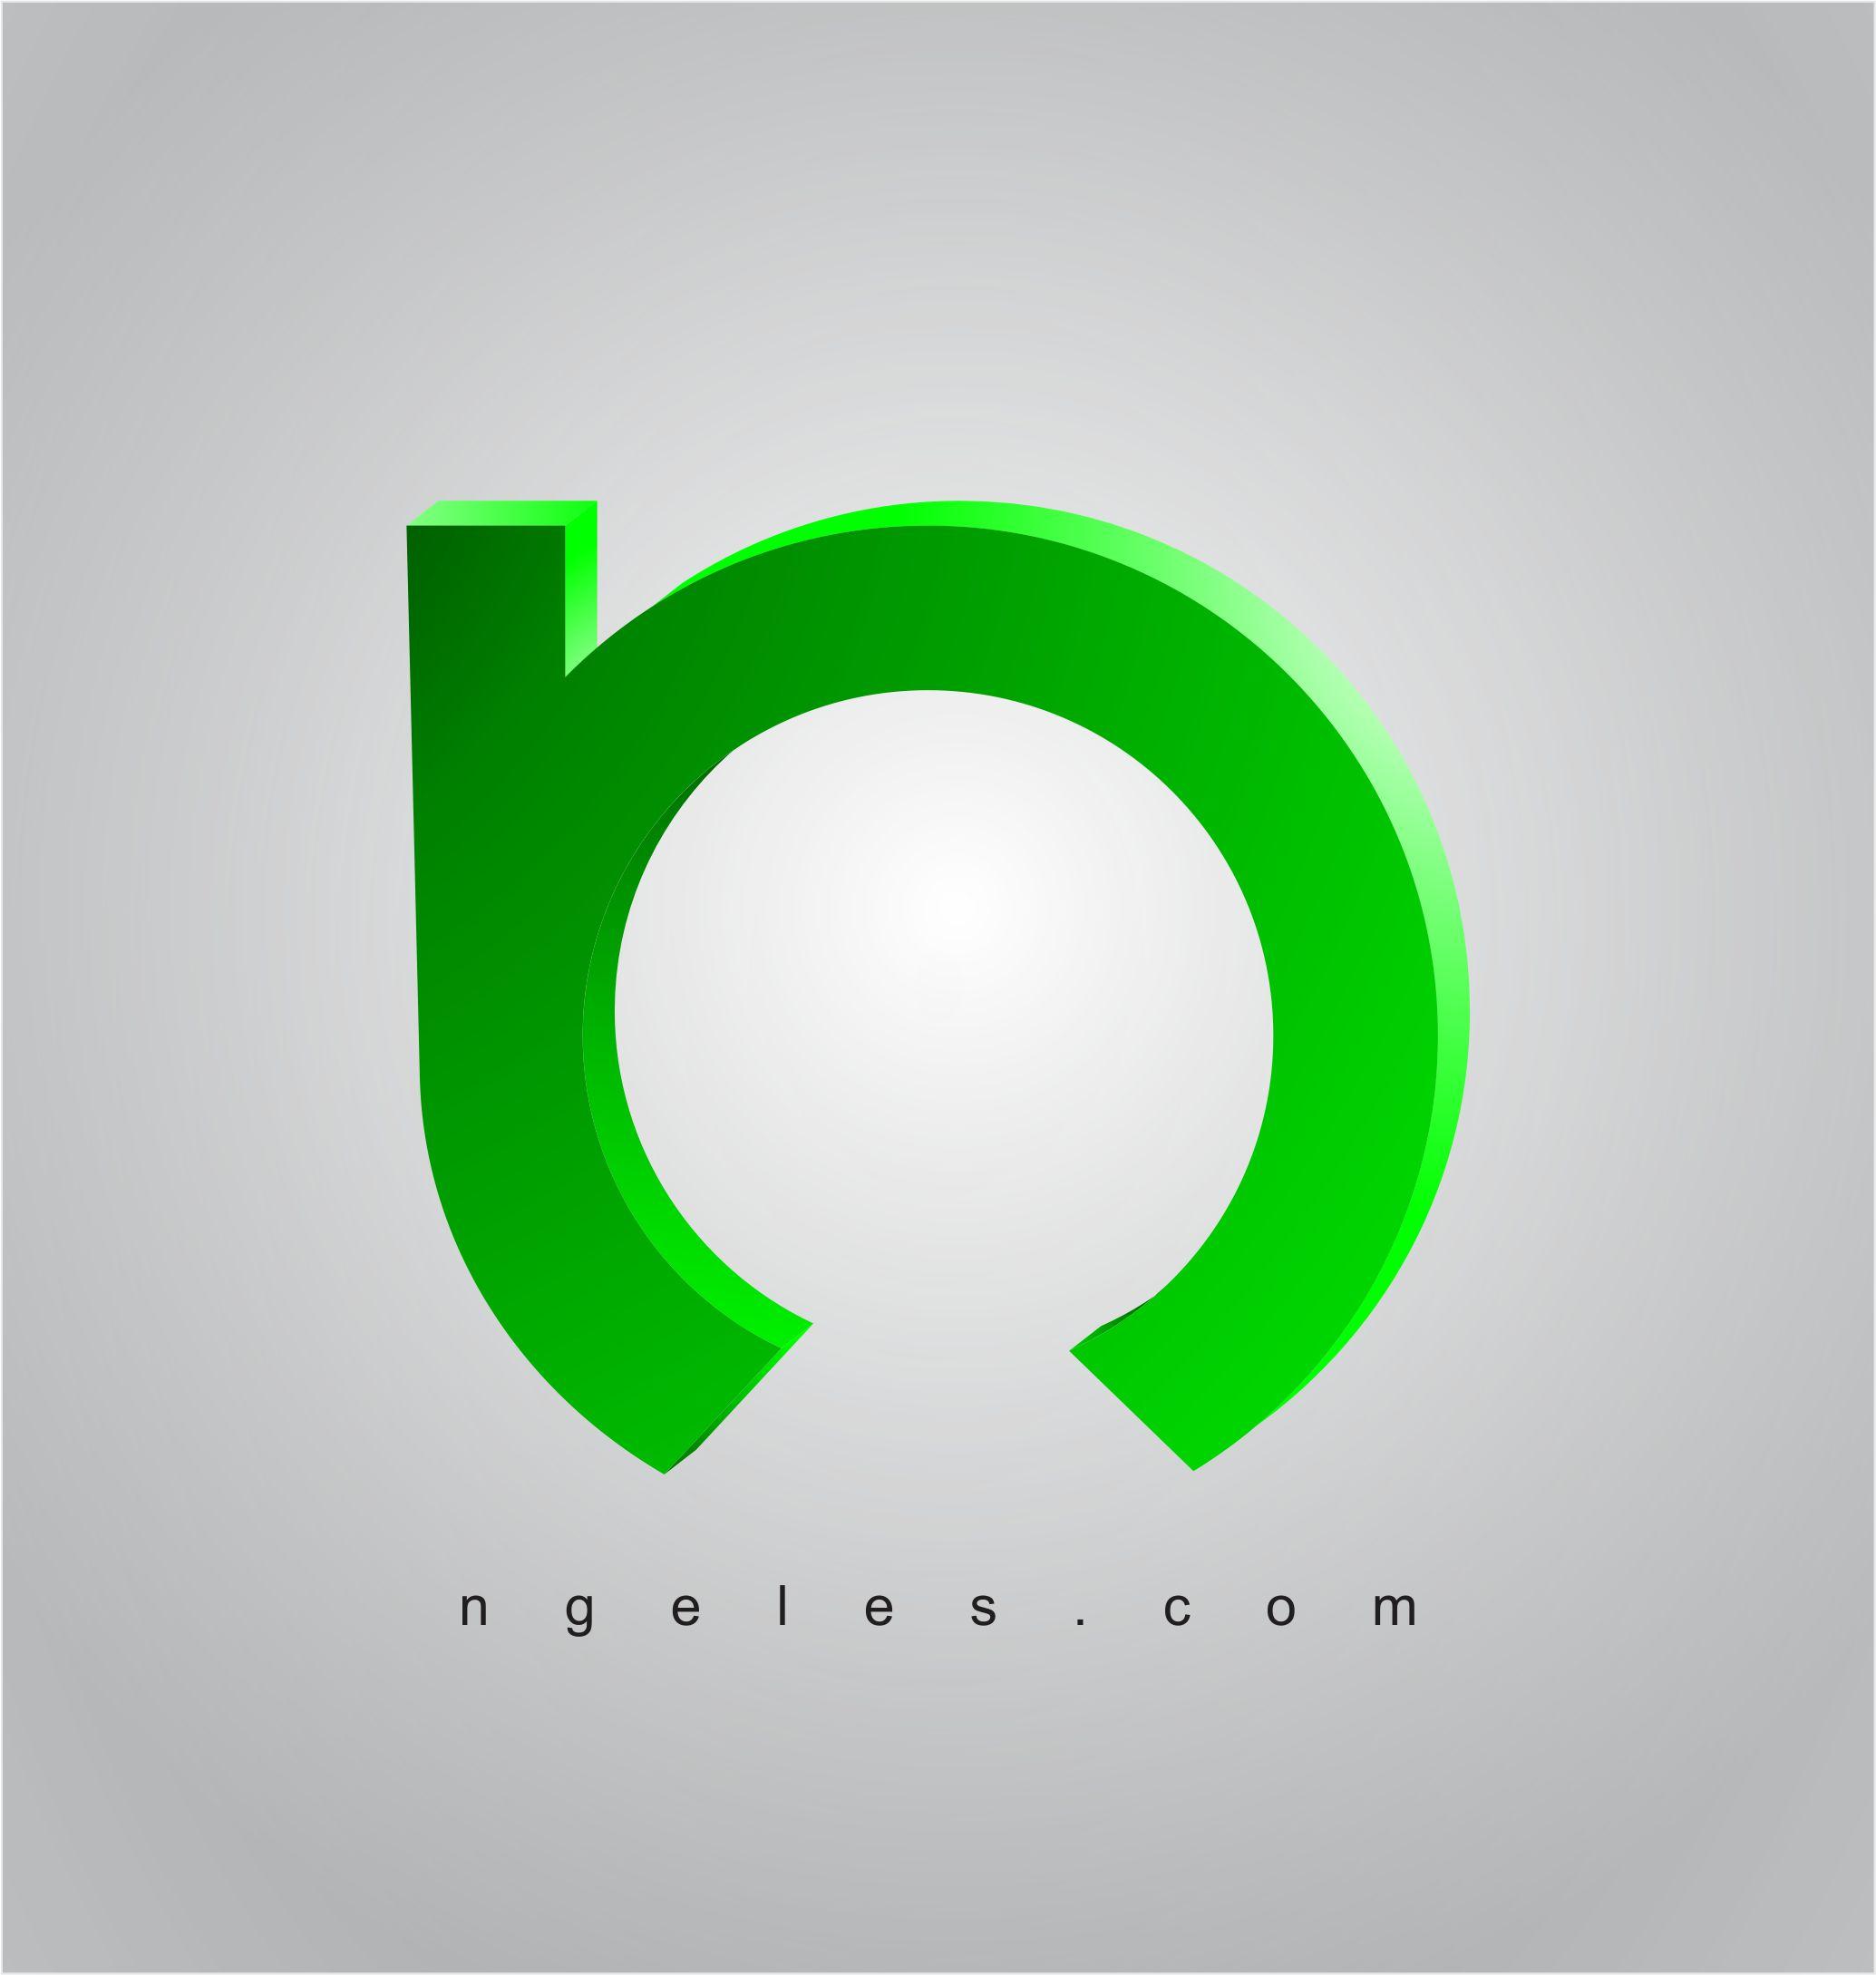 Tutorial cara mudah membuat logo menggunakan Coreldraw